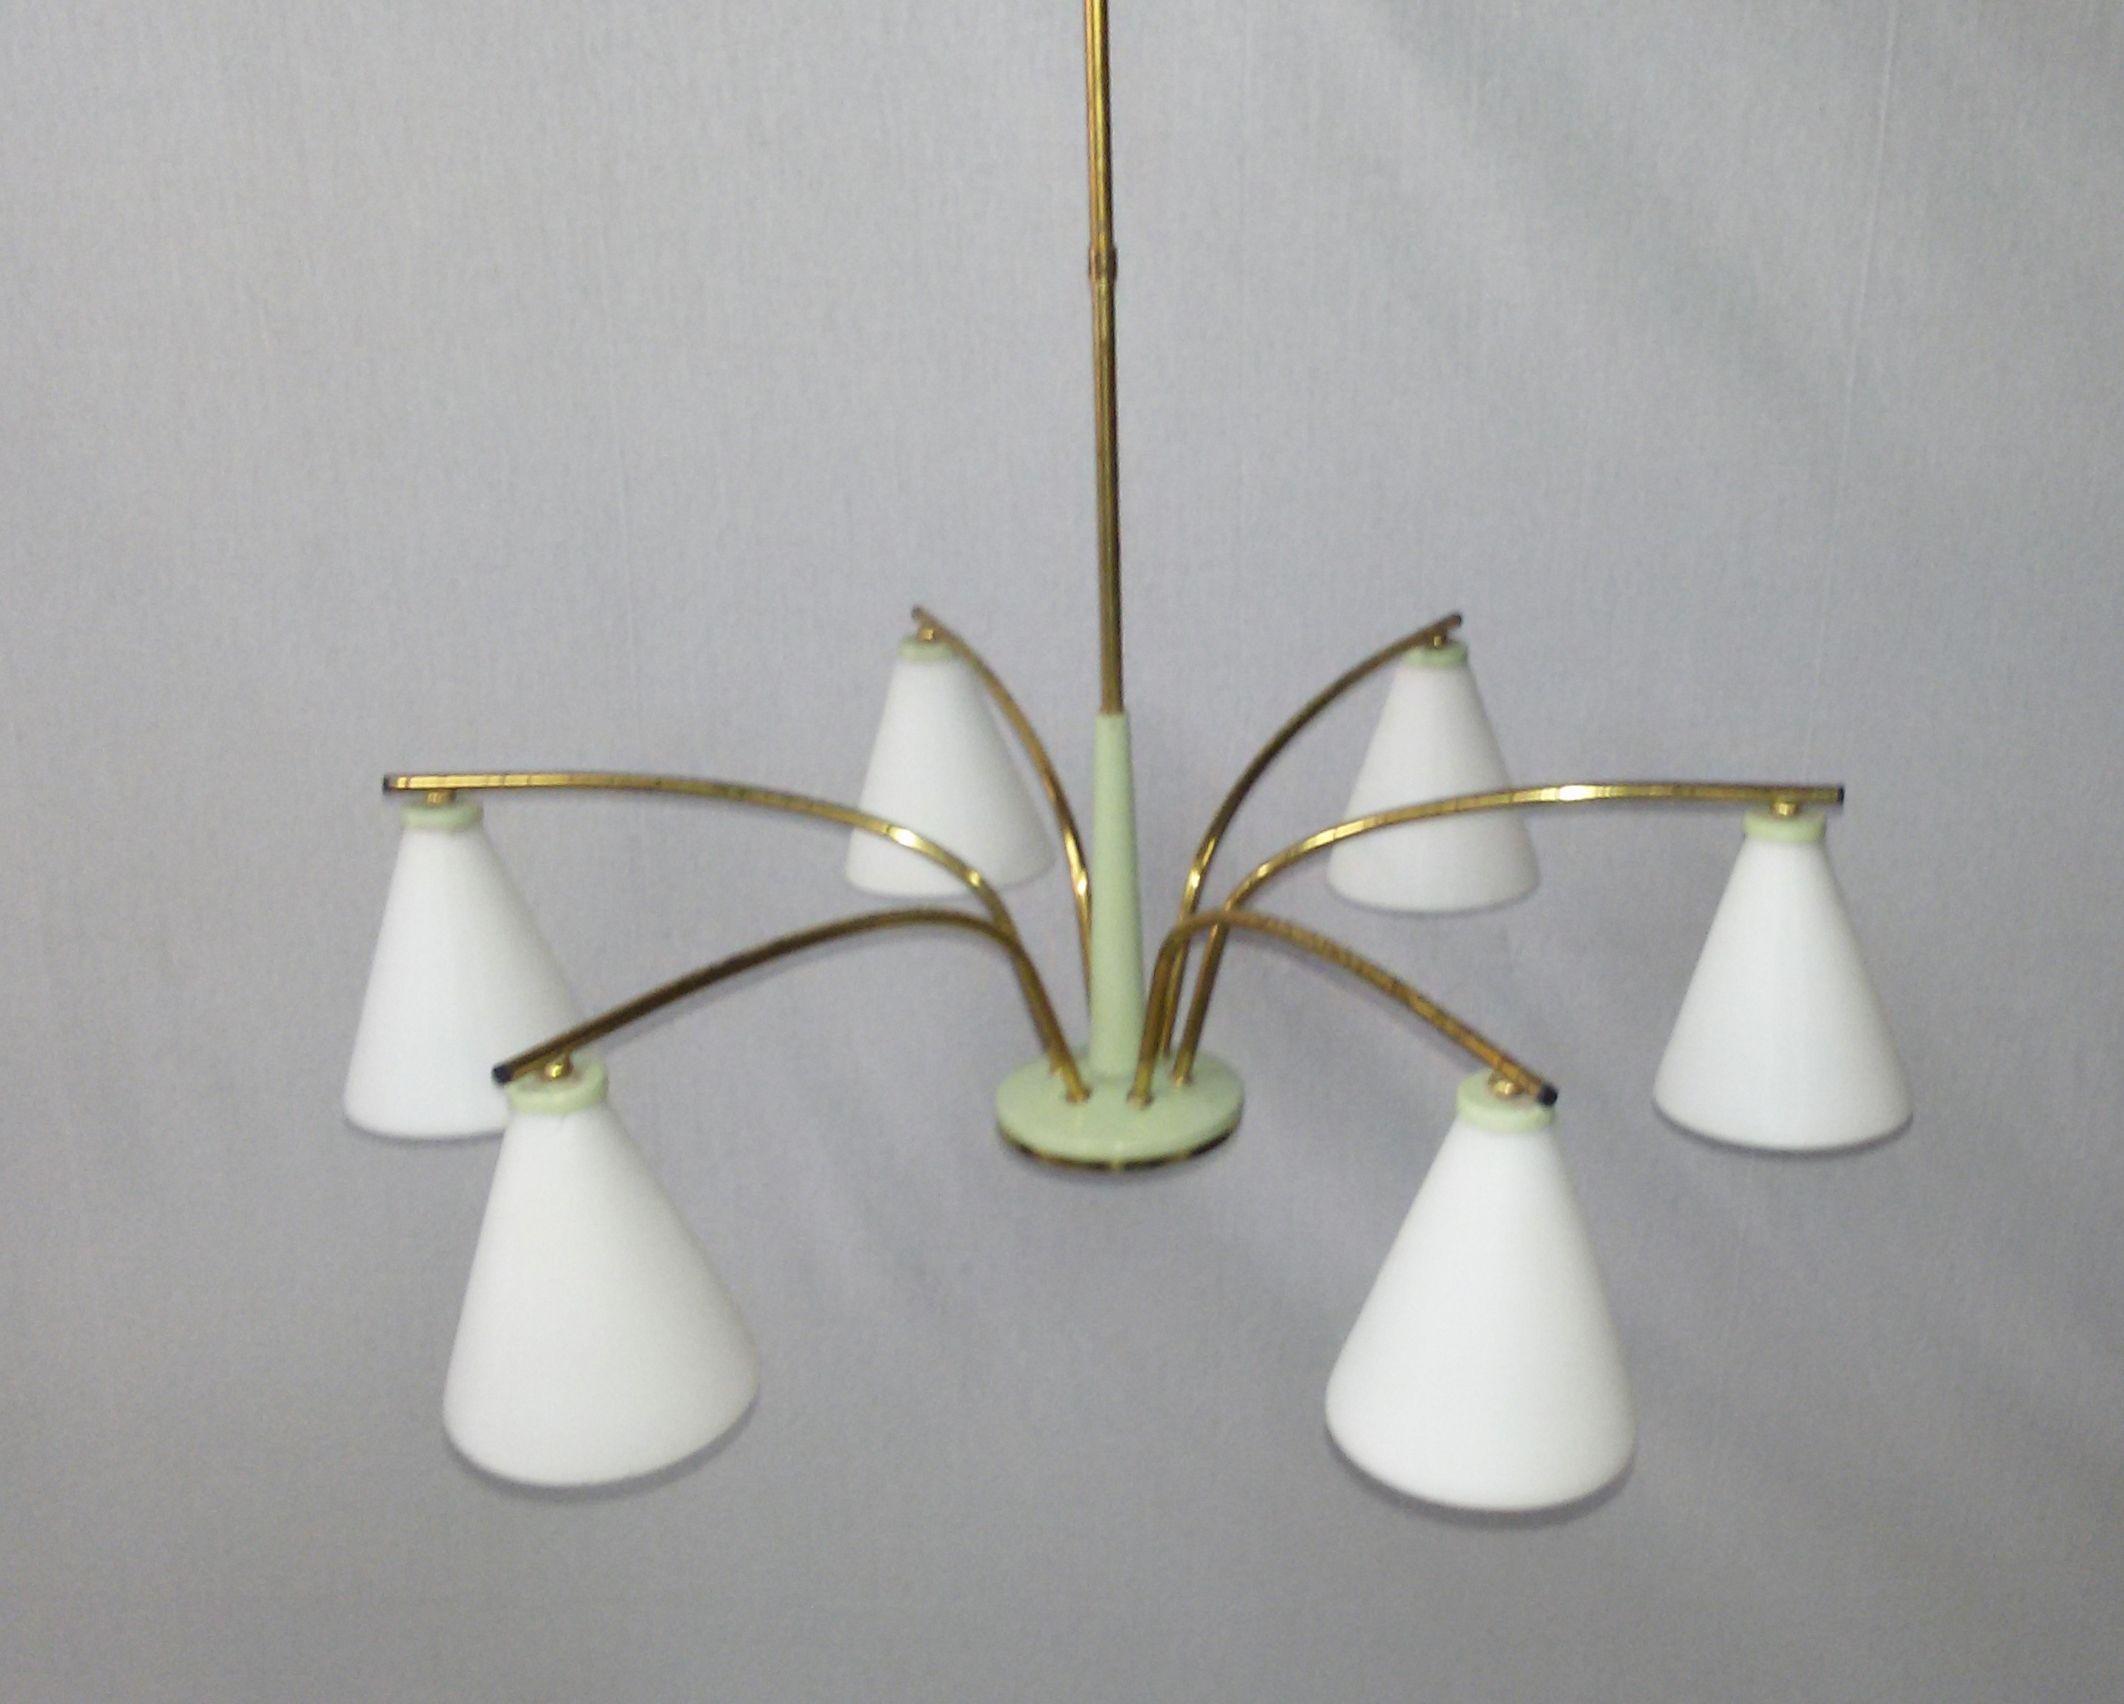 Lampadario,chandelier,6 luci,ottone design Stilnovo